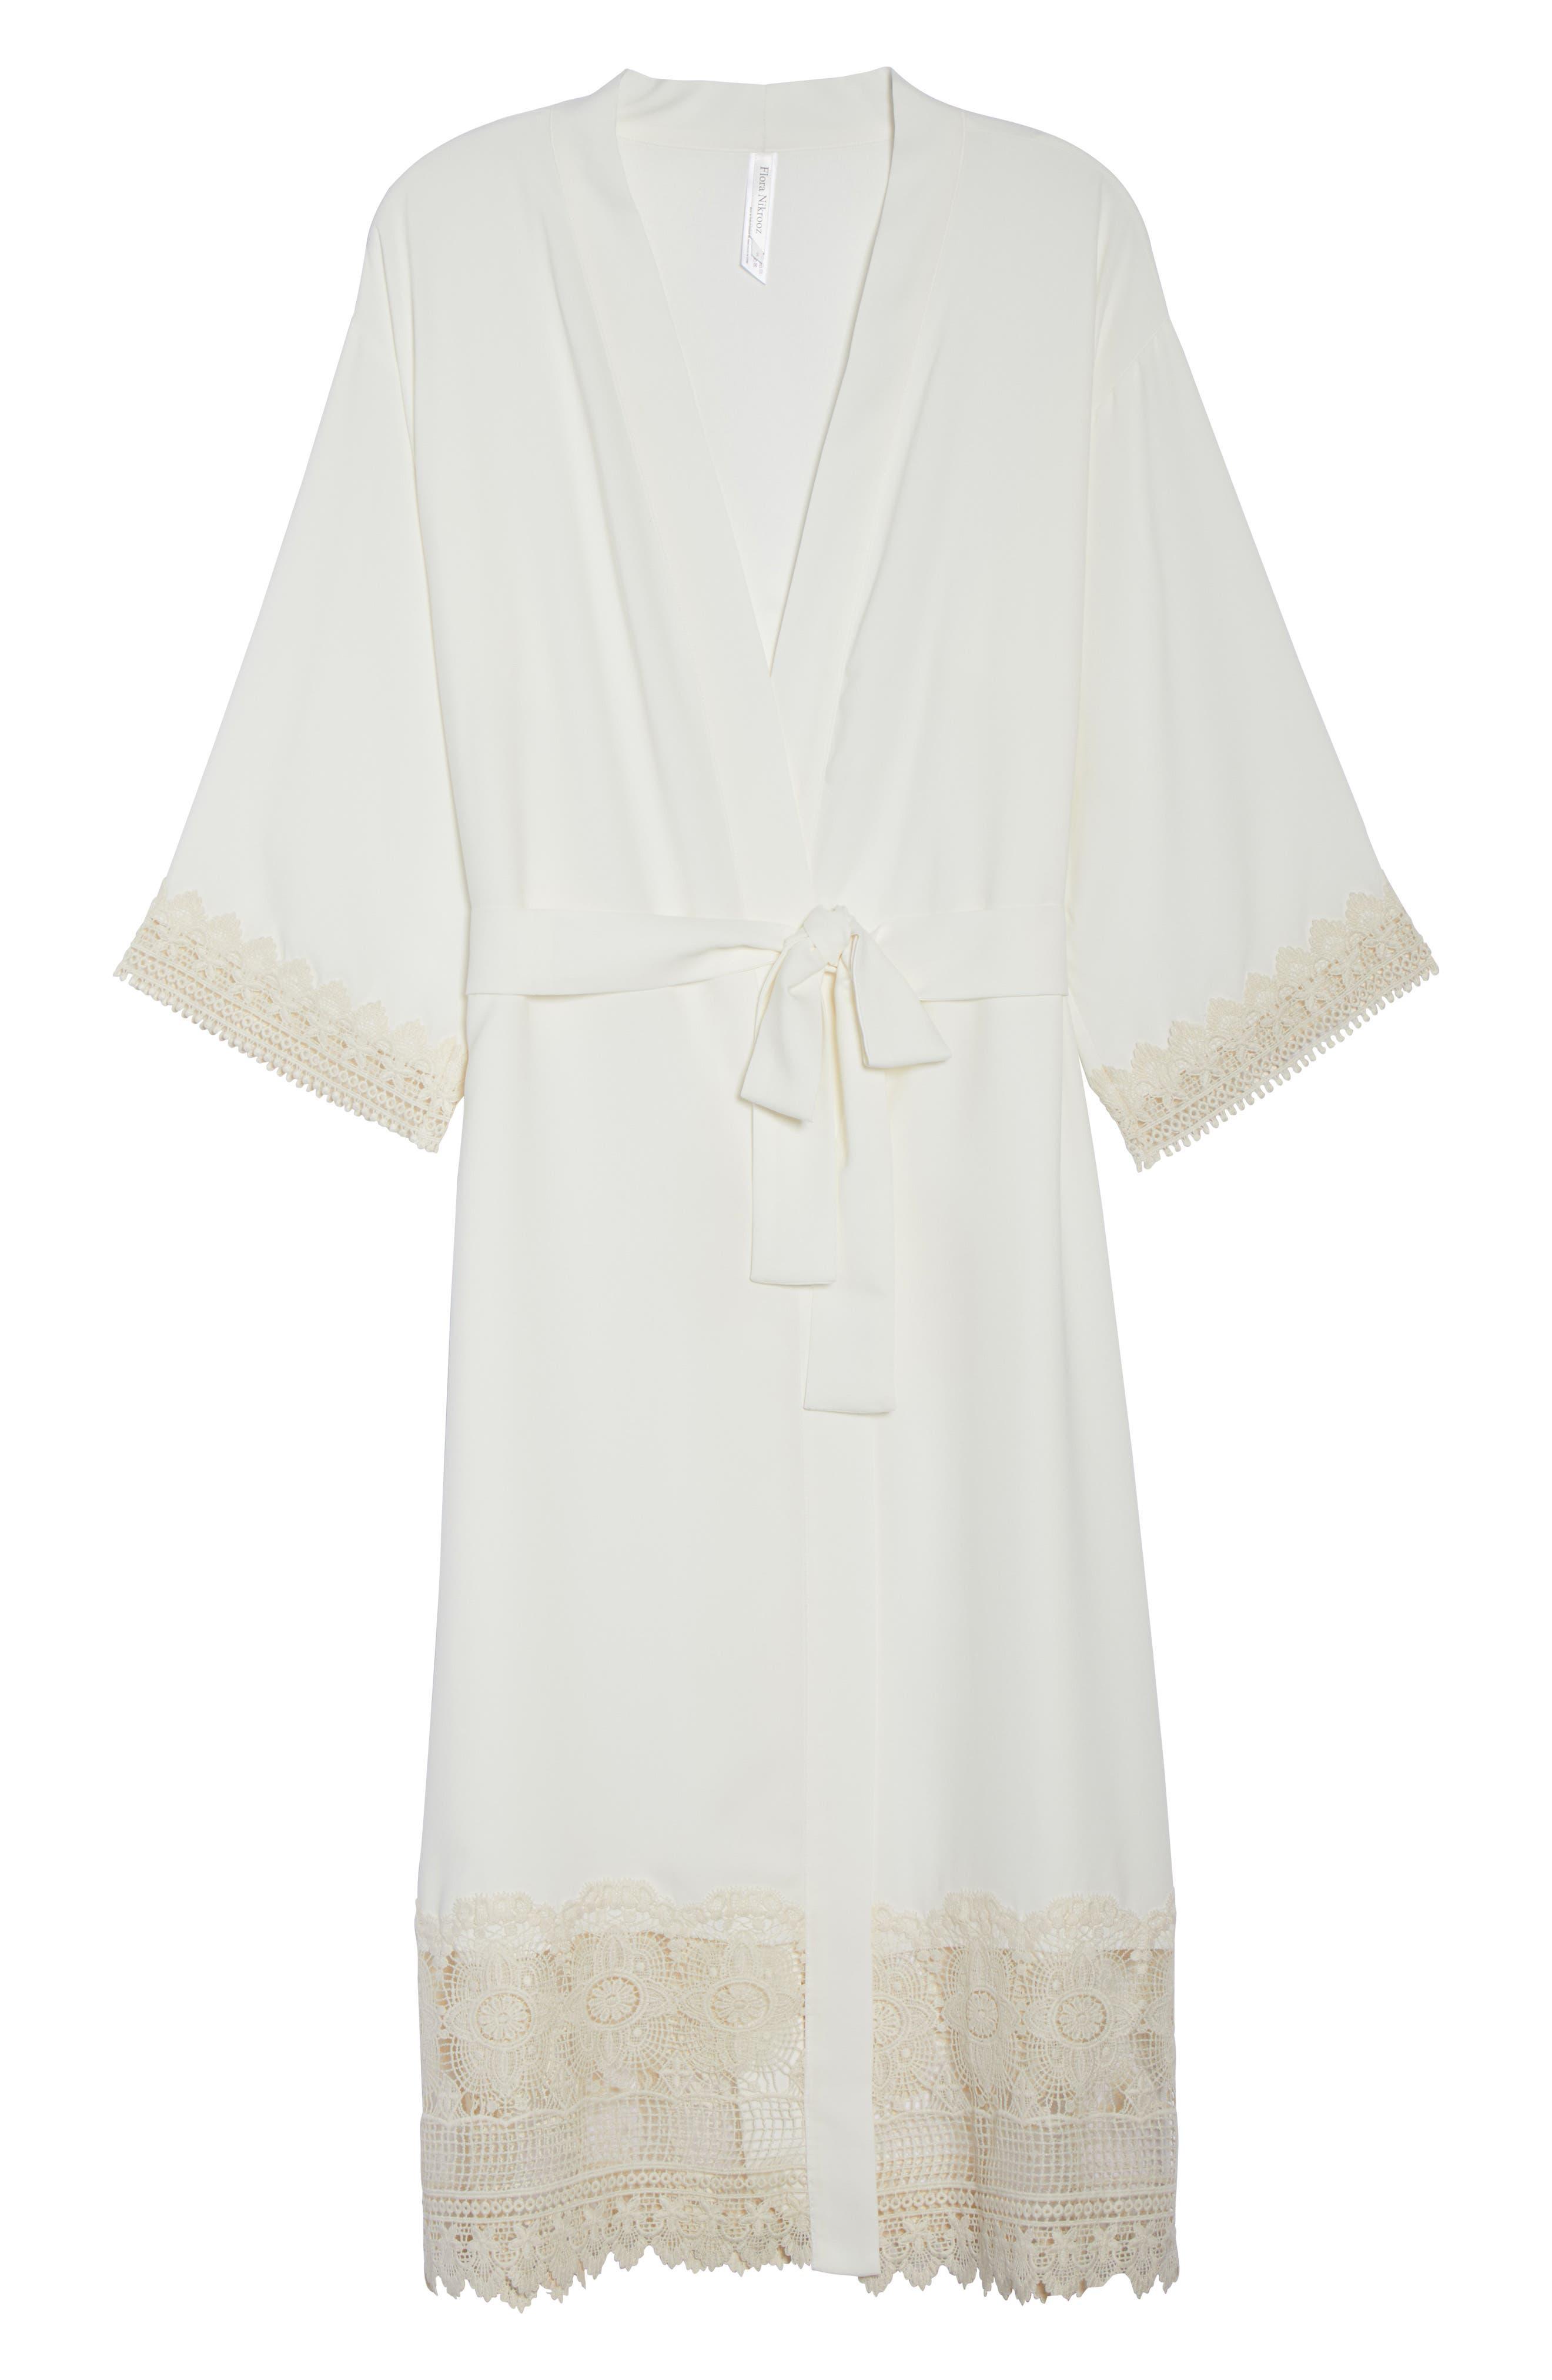 Blythe Robe,                             Alternate thumbnail 6, color,                             903